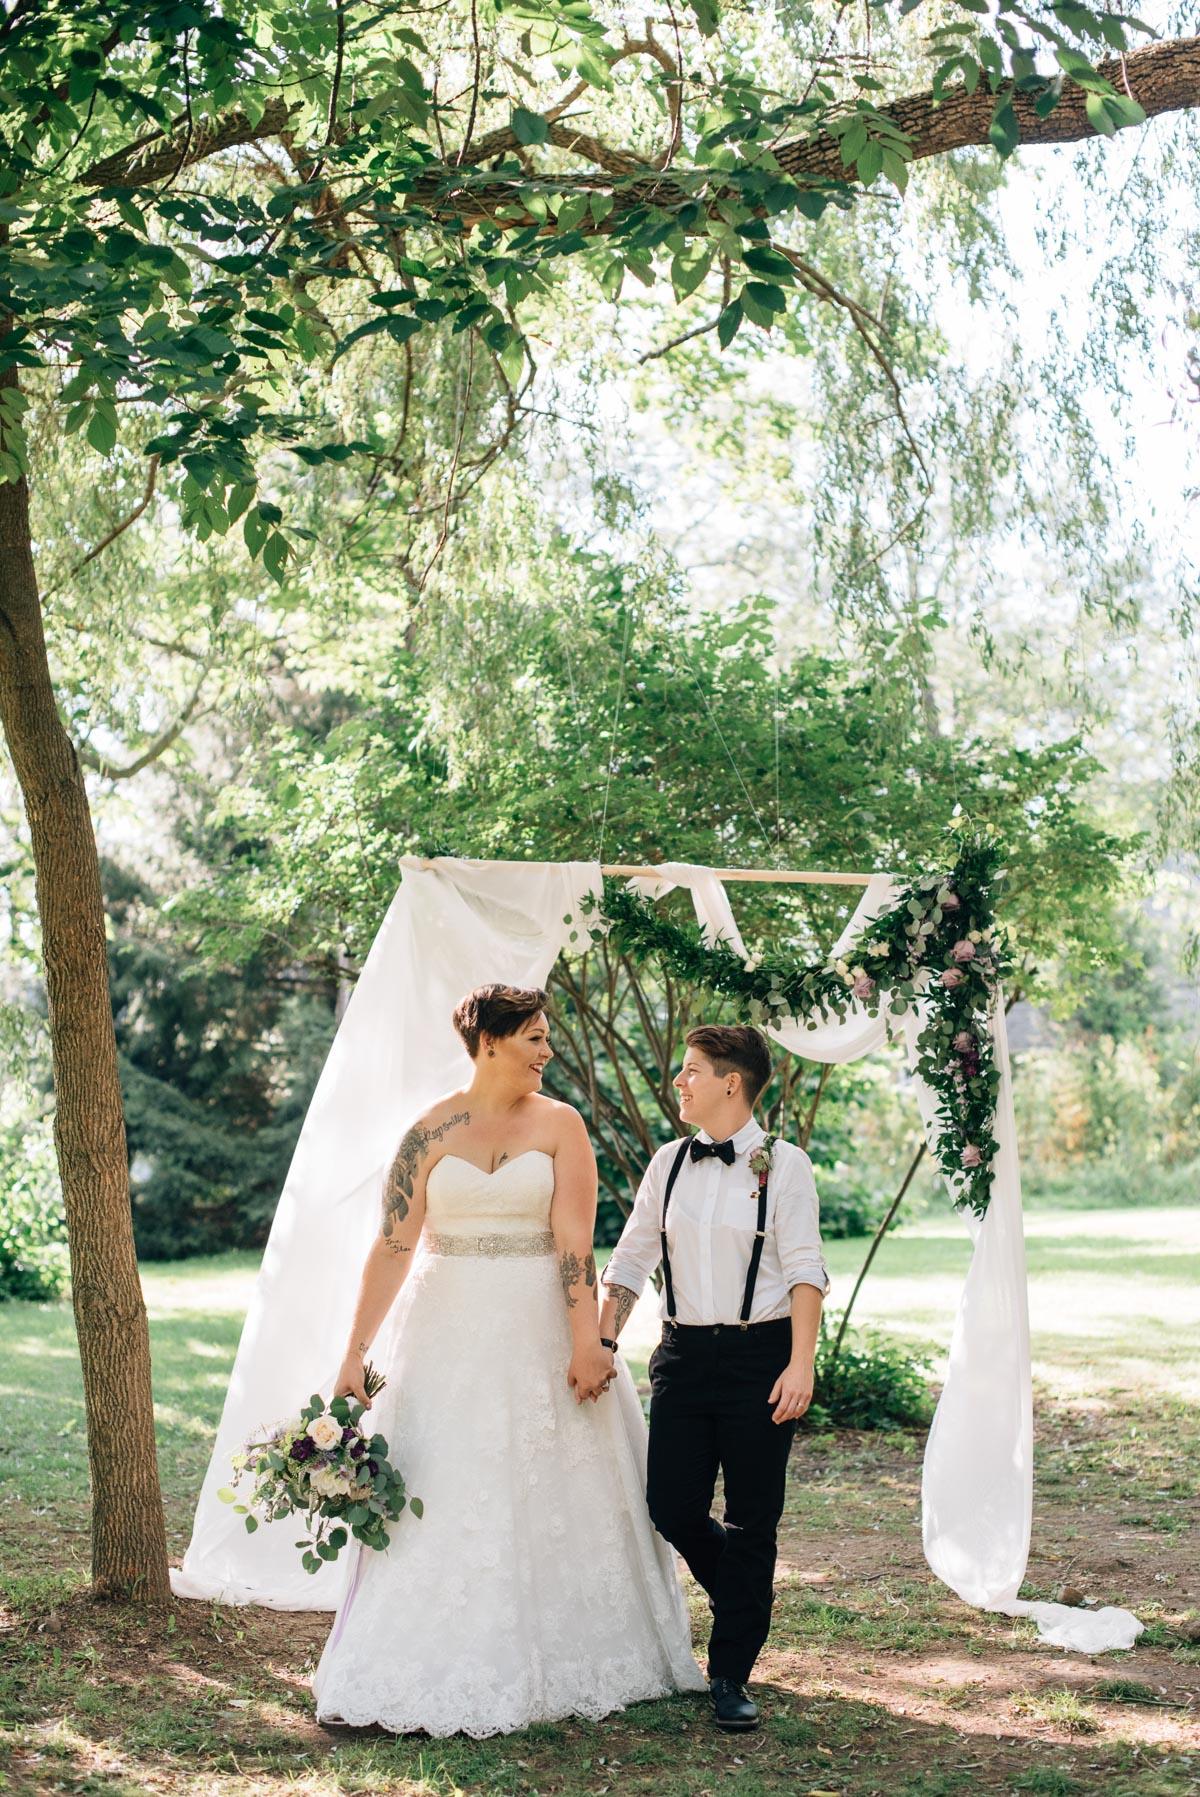 sara-wilde-photography-vineyard-bride-swish-list-beamer-falls-manor-grimsby-wedding-56.jpg